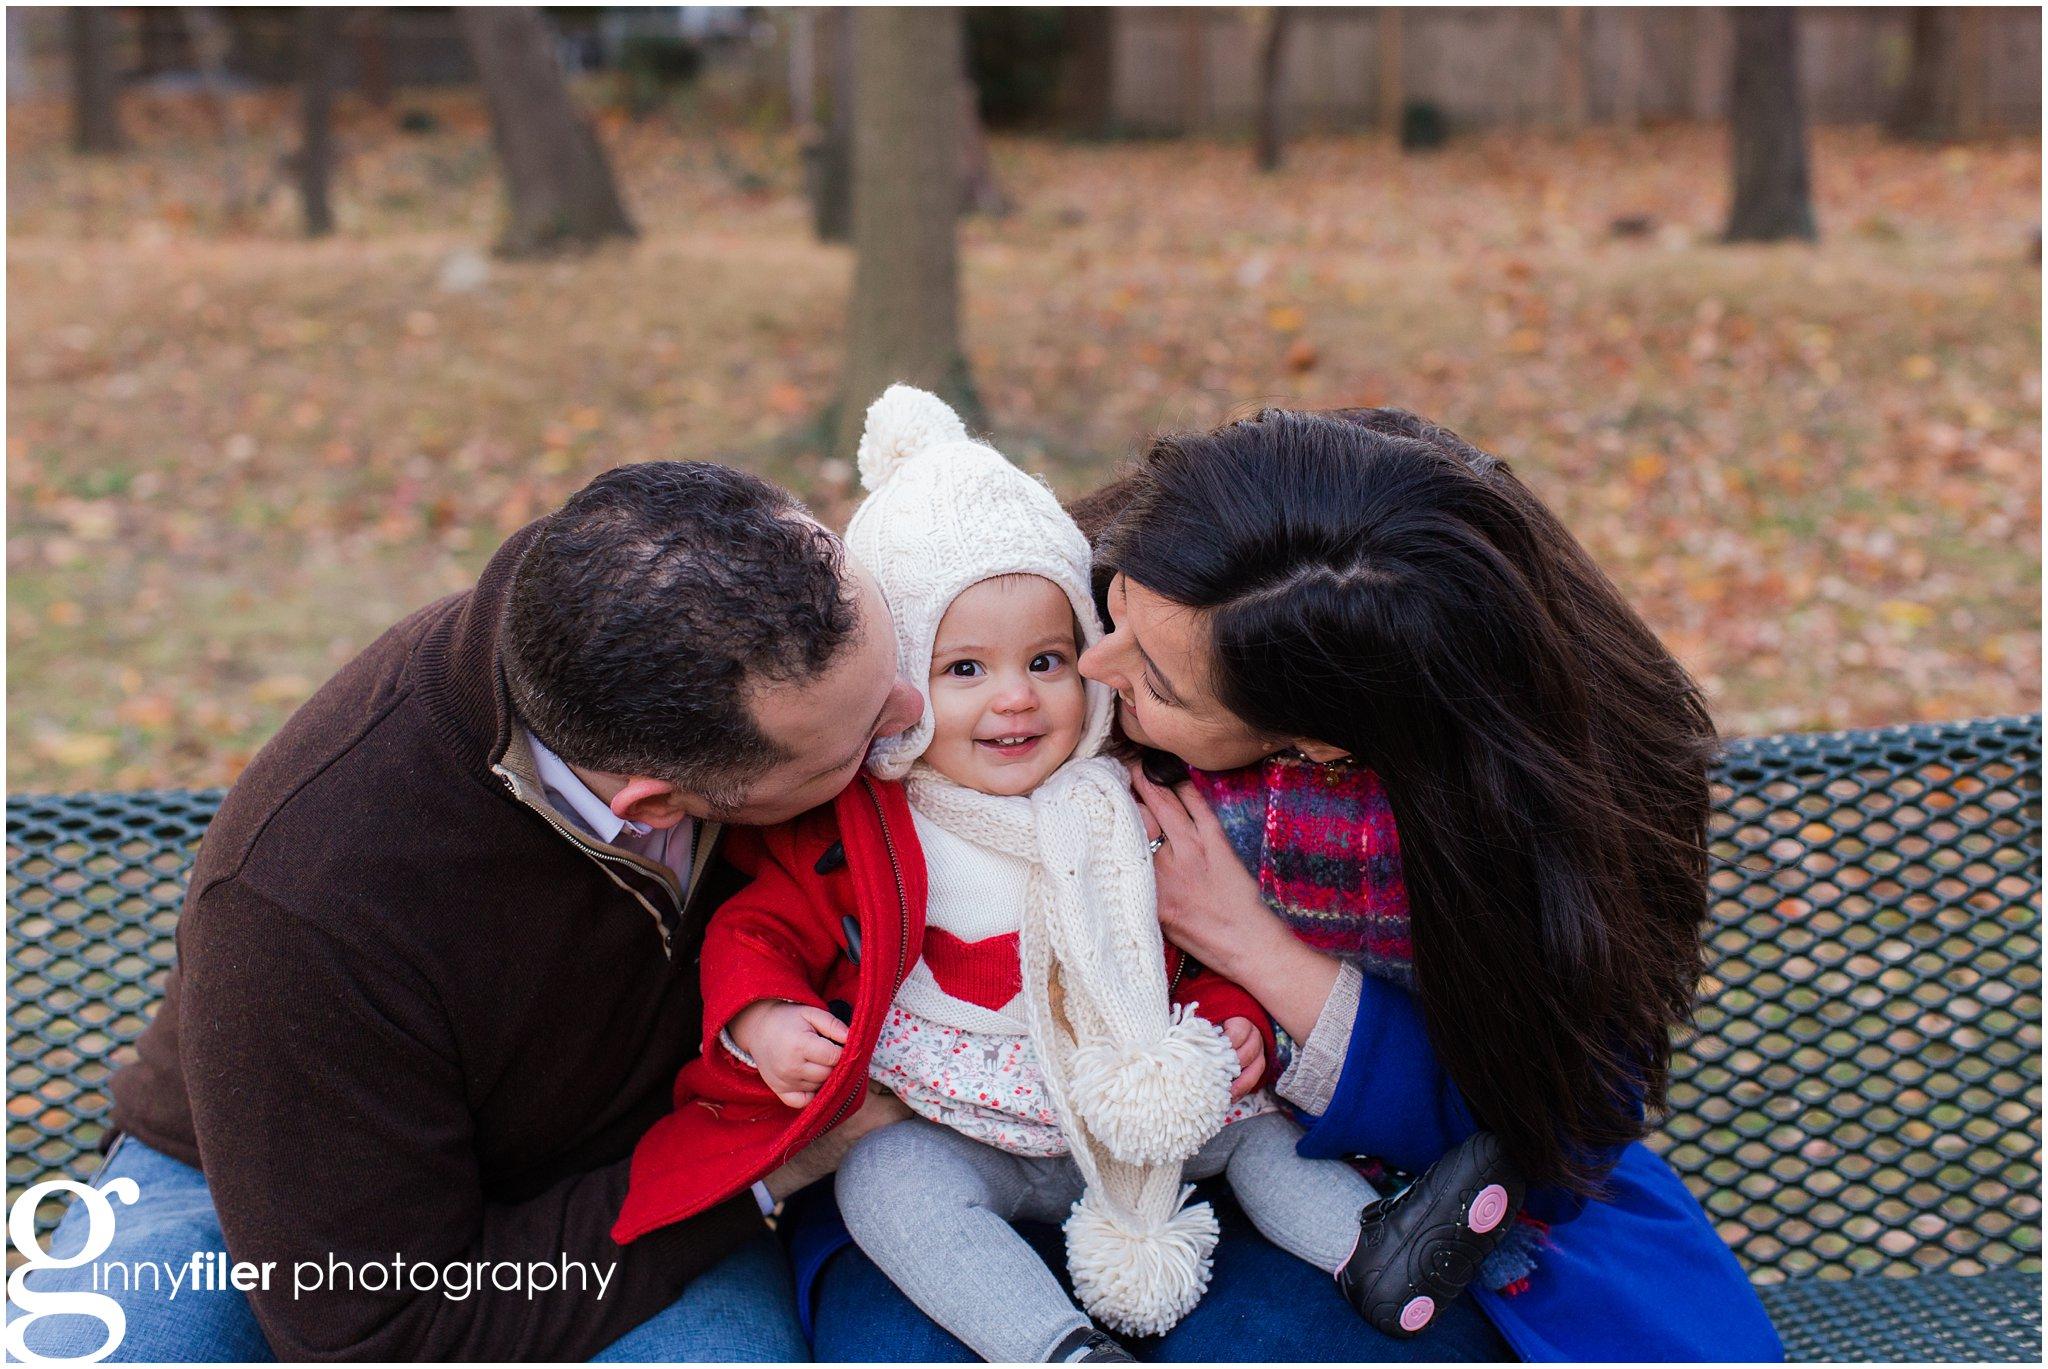 family_photography_Sanchez_0019.jpg